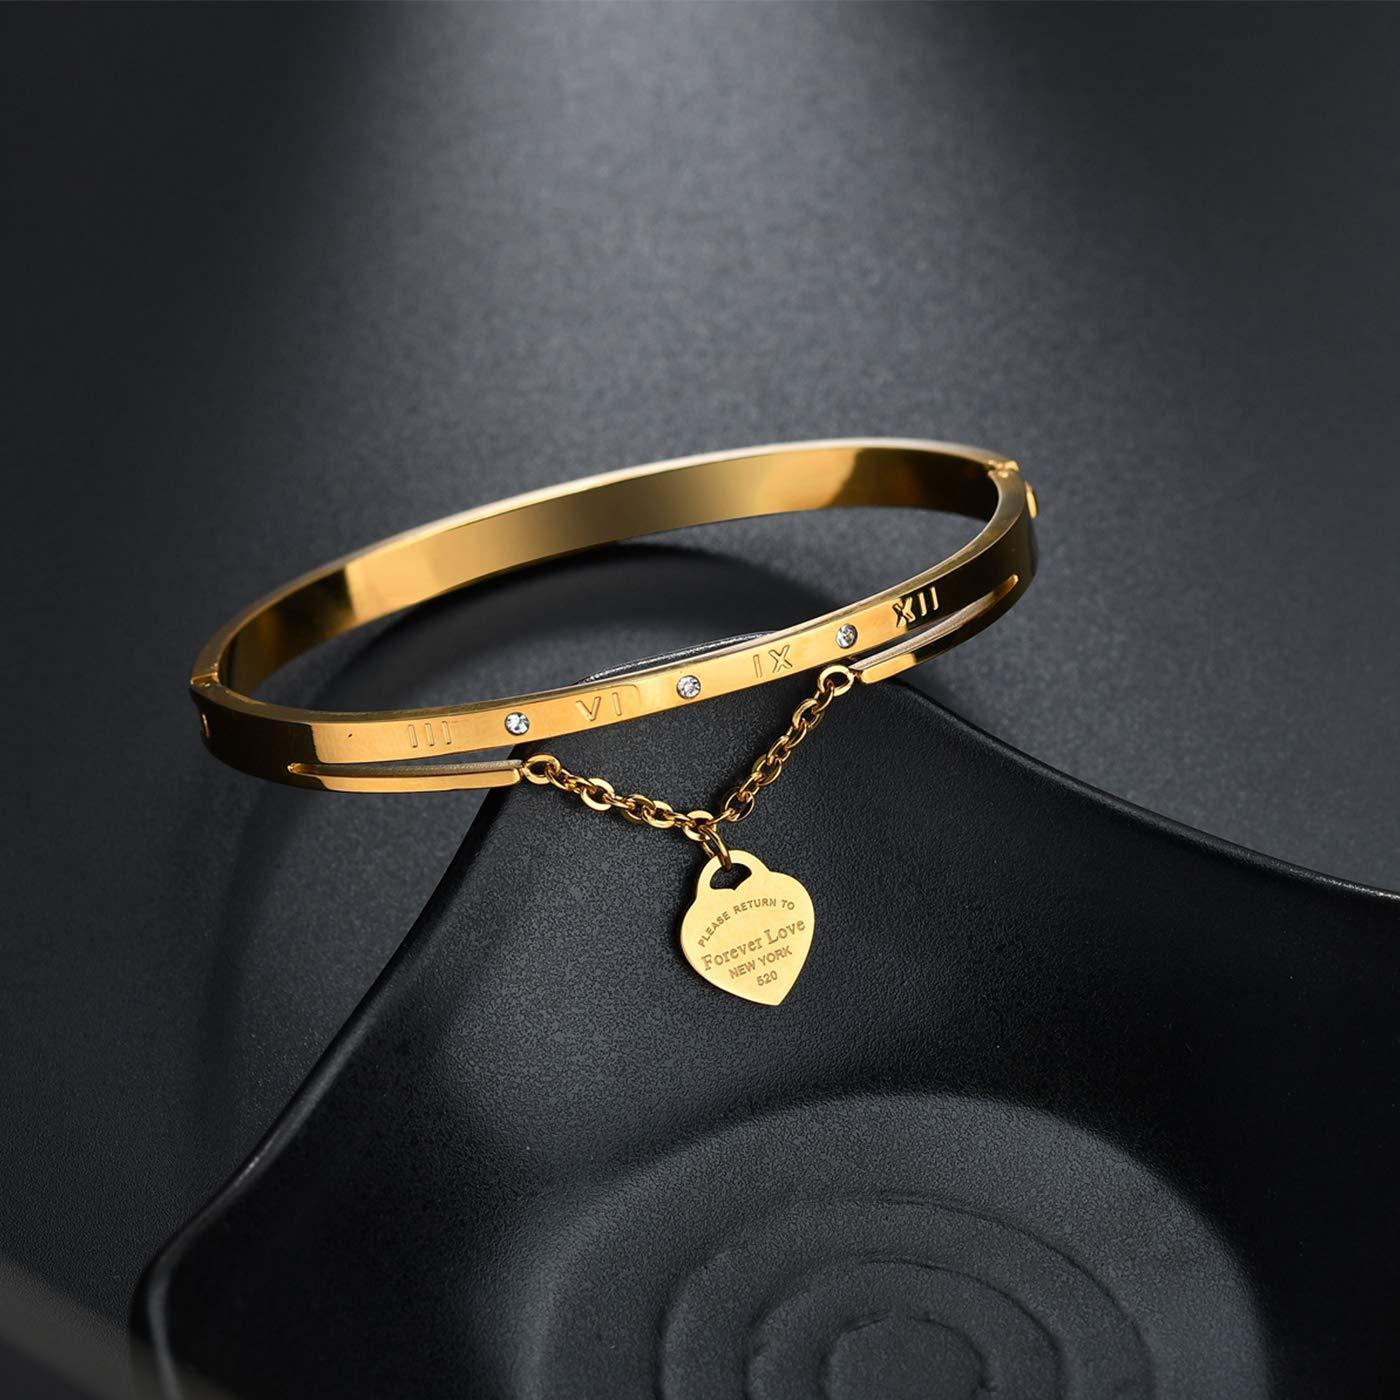 Panlady Women Stainless Steel Interchangeable Bangle Bracelet with Rhinestone Forever Love Heart Pendant Roman Numberal Bracelet for Wedding Anniversary